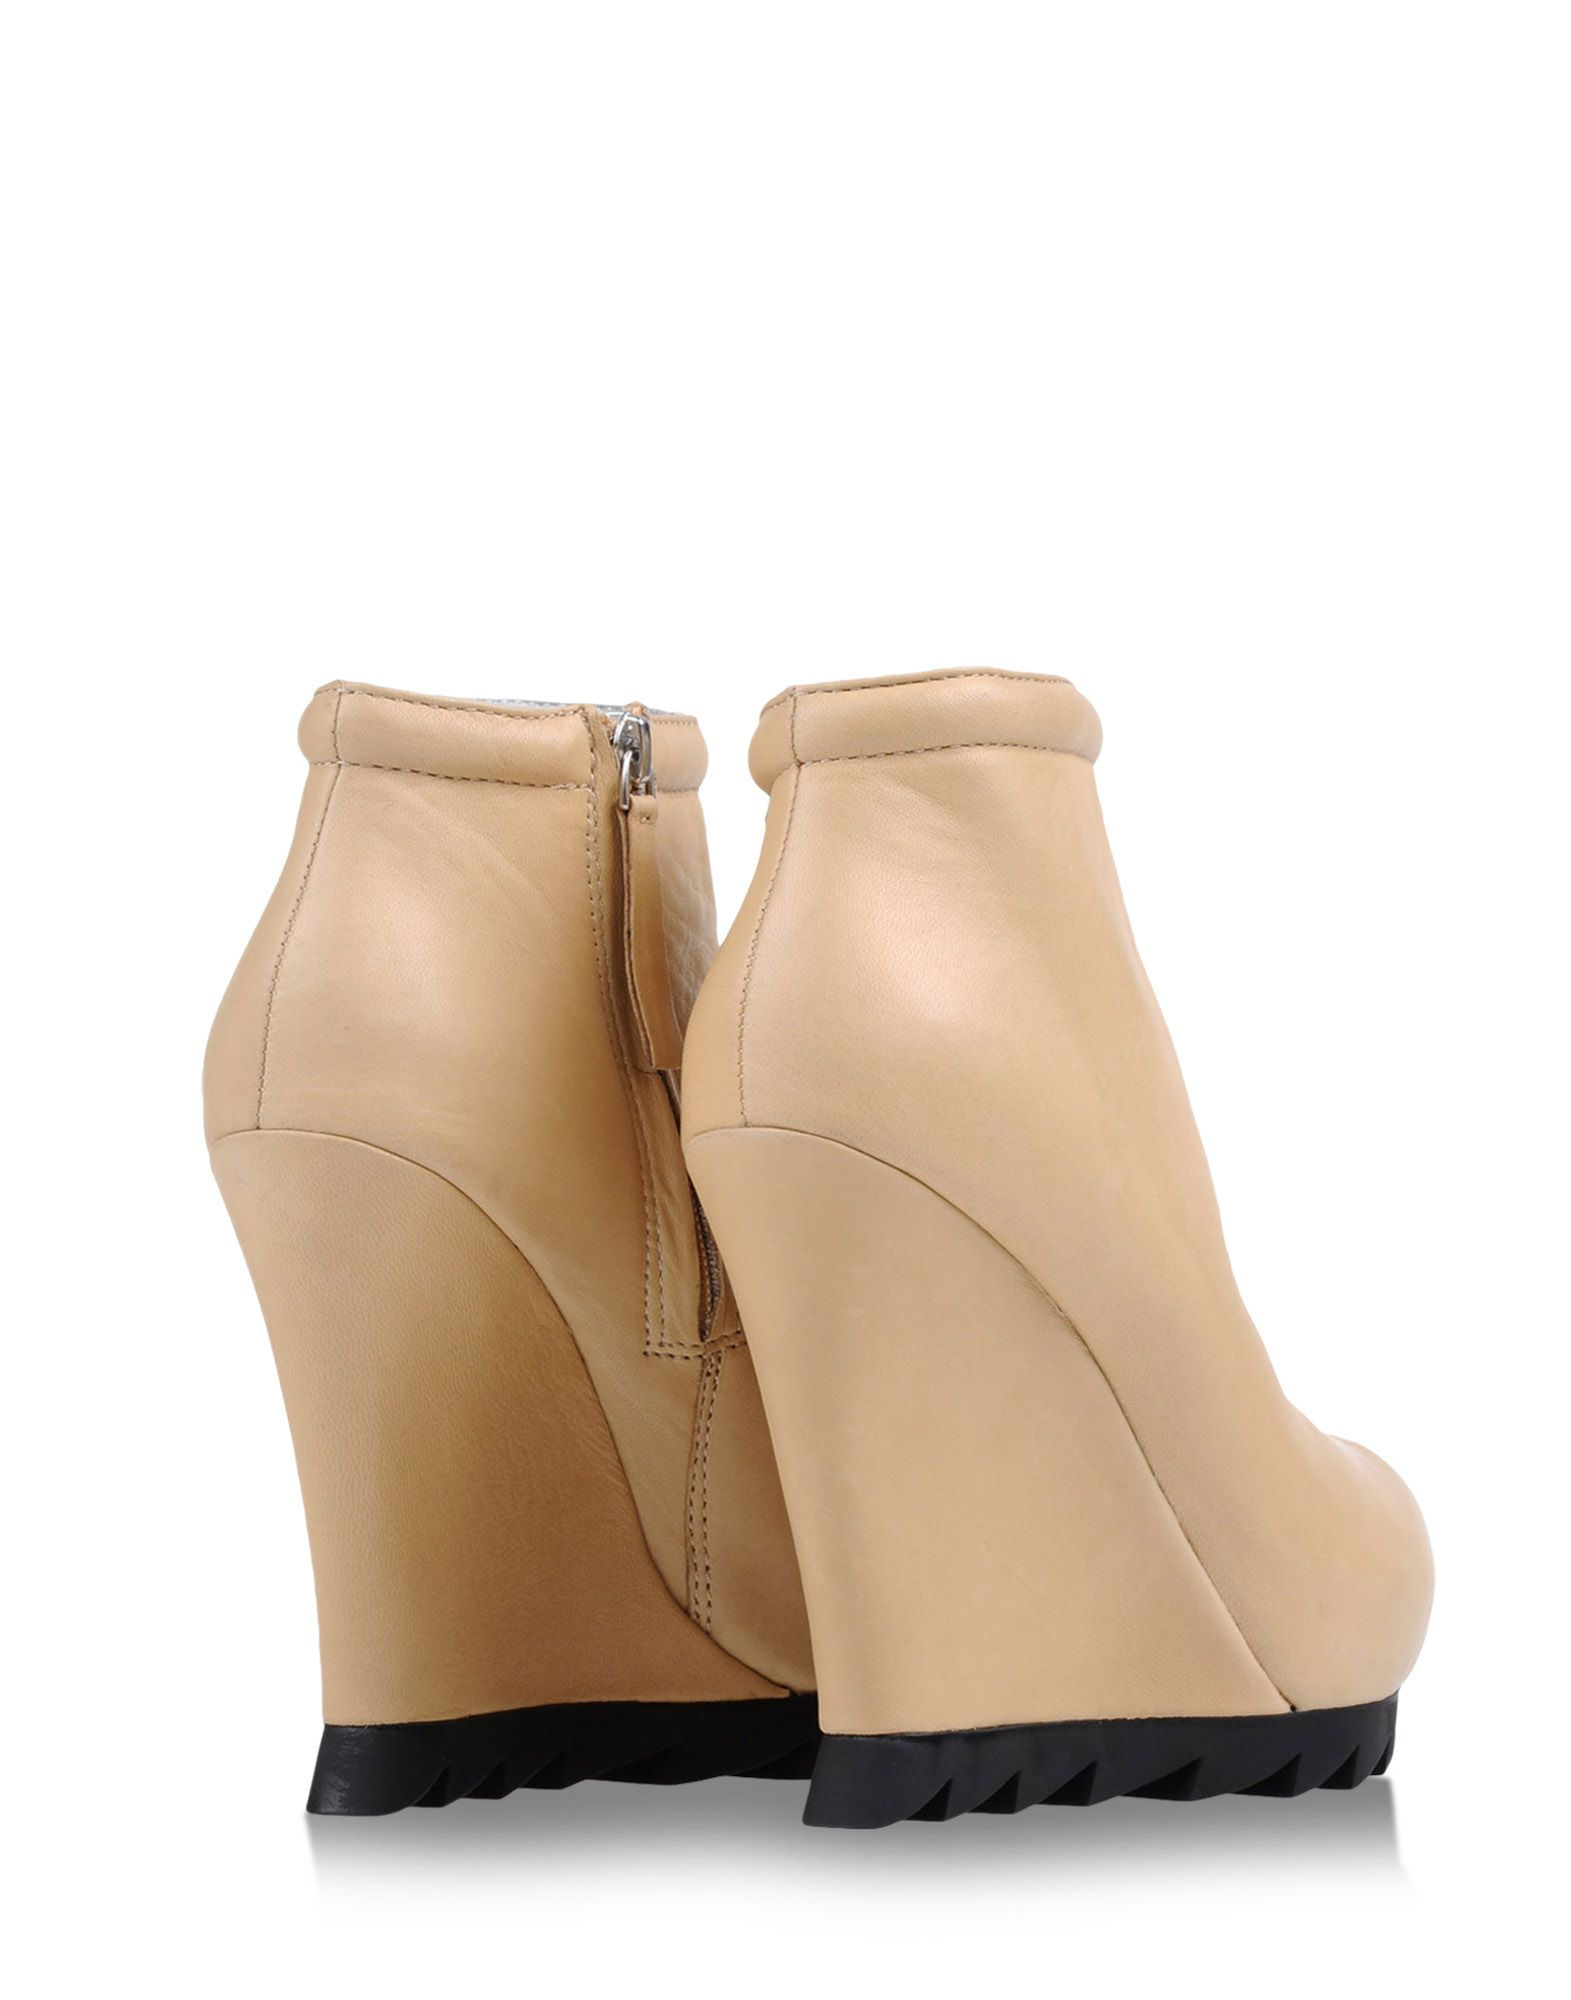 camilla skovgaard ankle boots in beige lyst. Black Bedroom Furniture Sets. Home Design Ideas